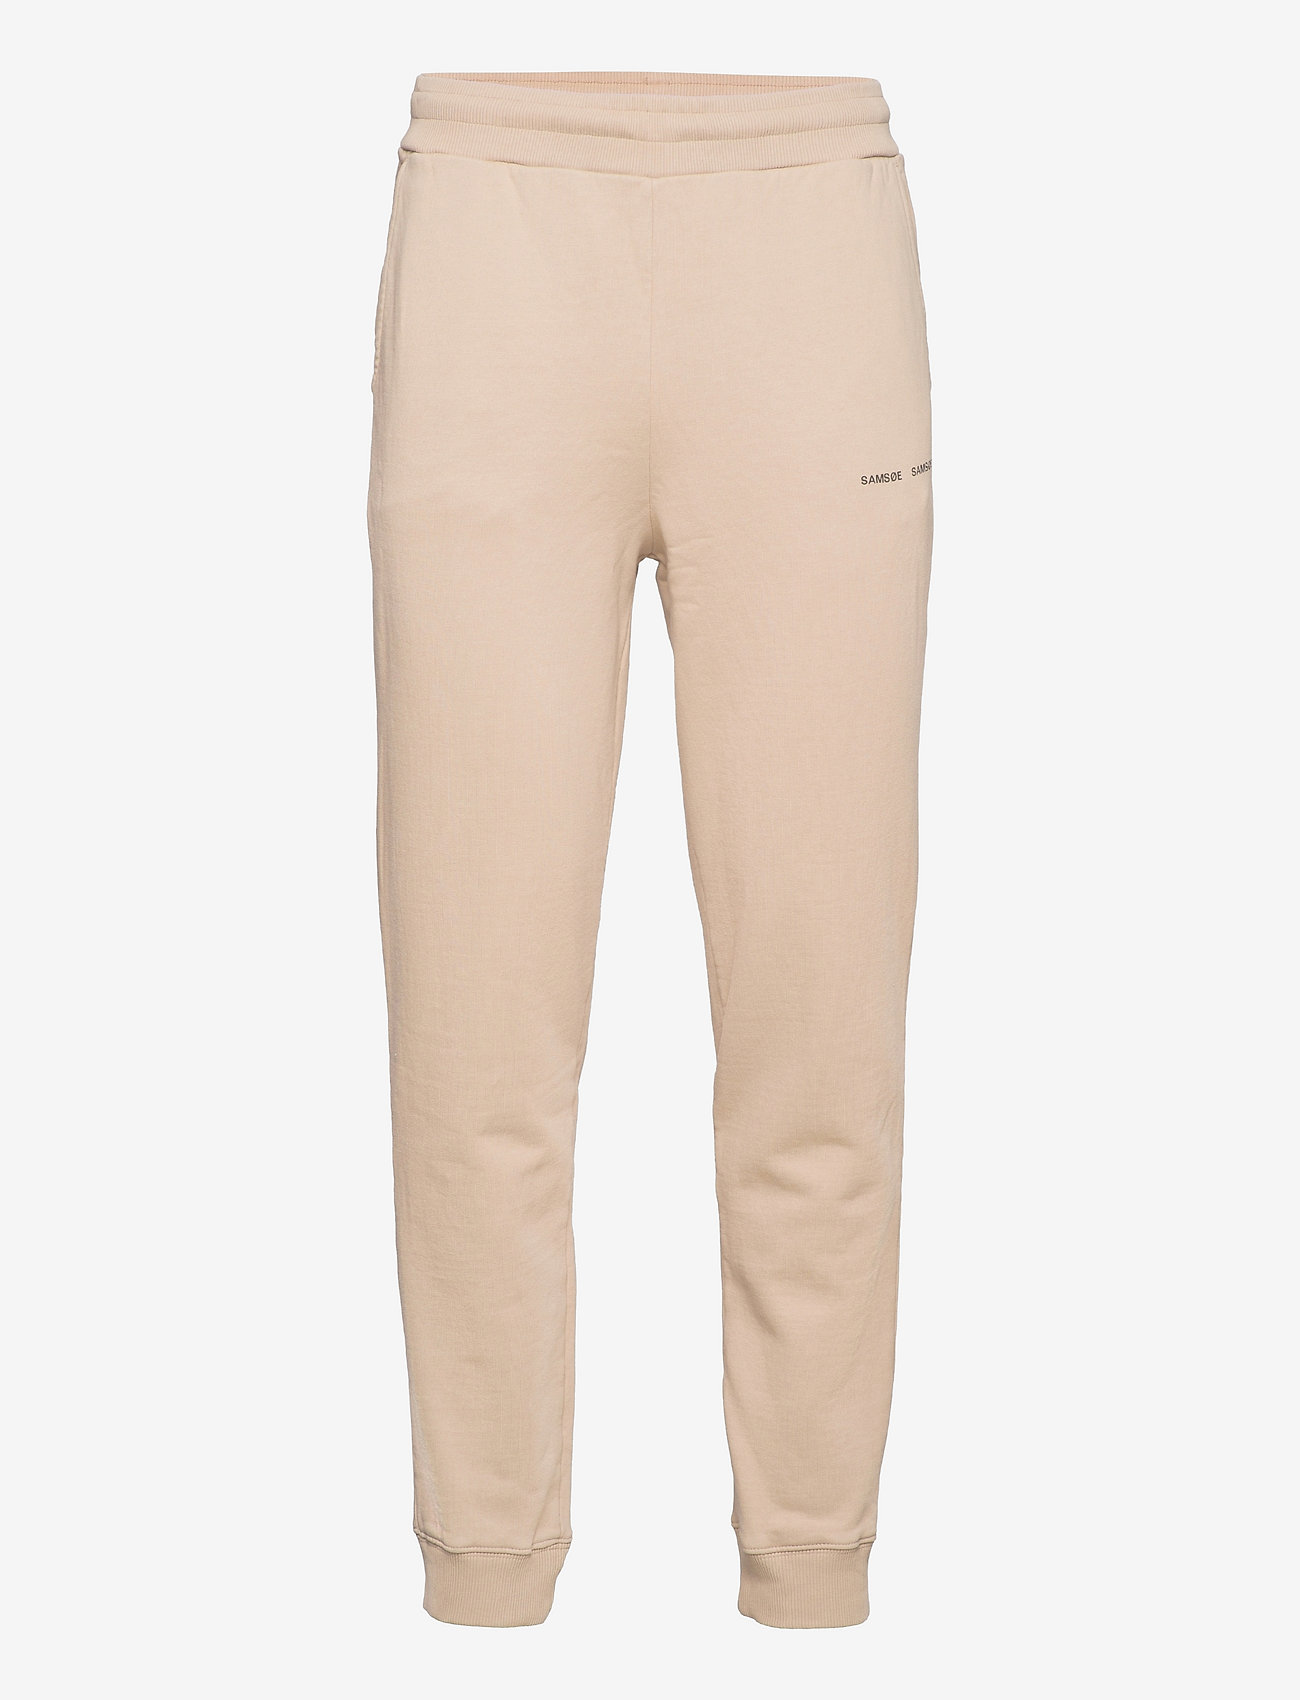 Samsøe Samsøe - Norsbro trousers 11720 - kleding - humus - 0